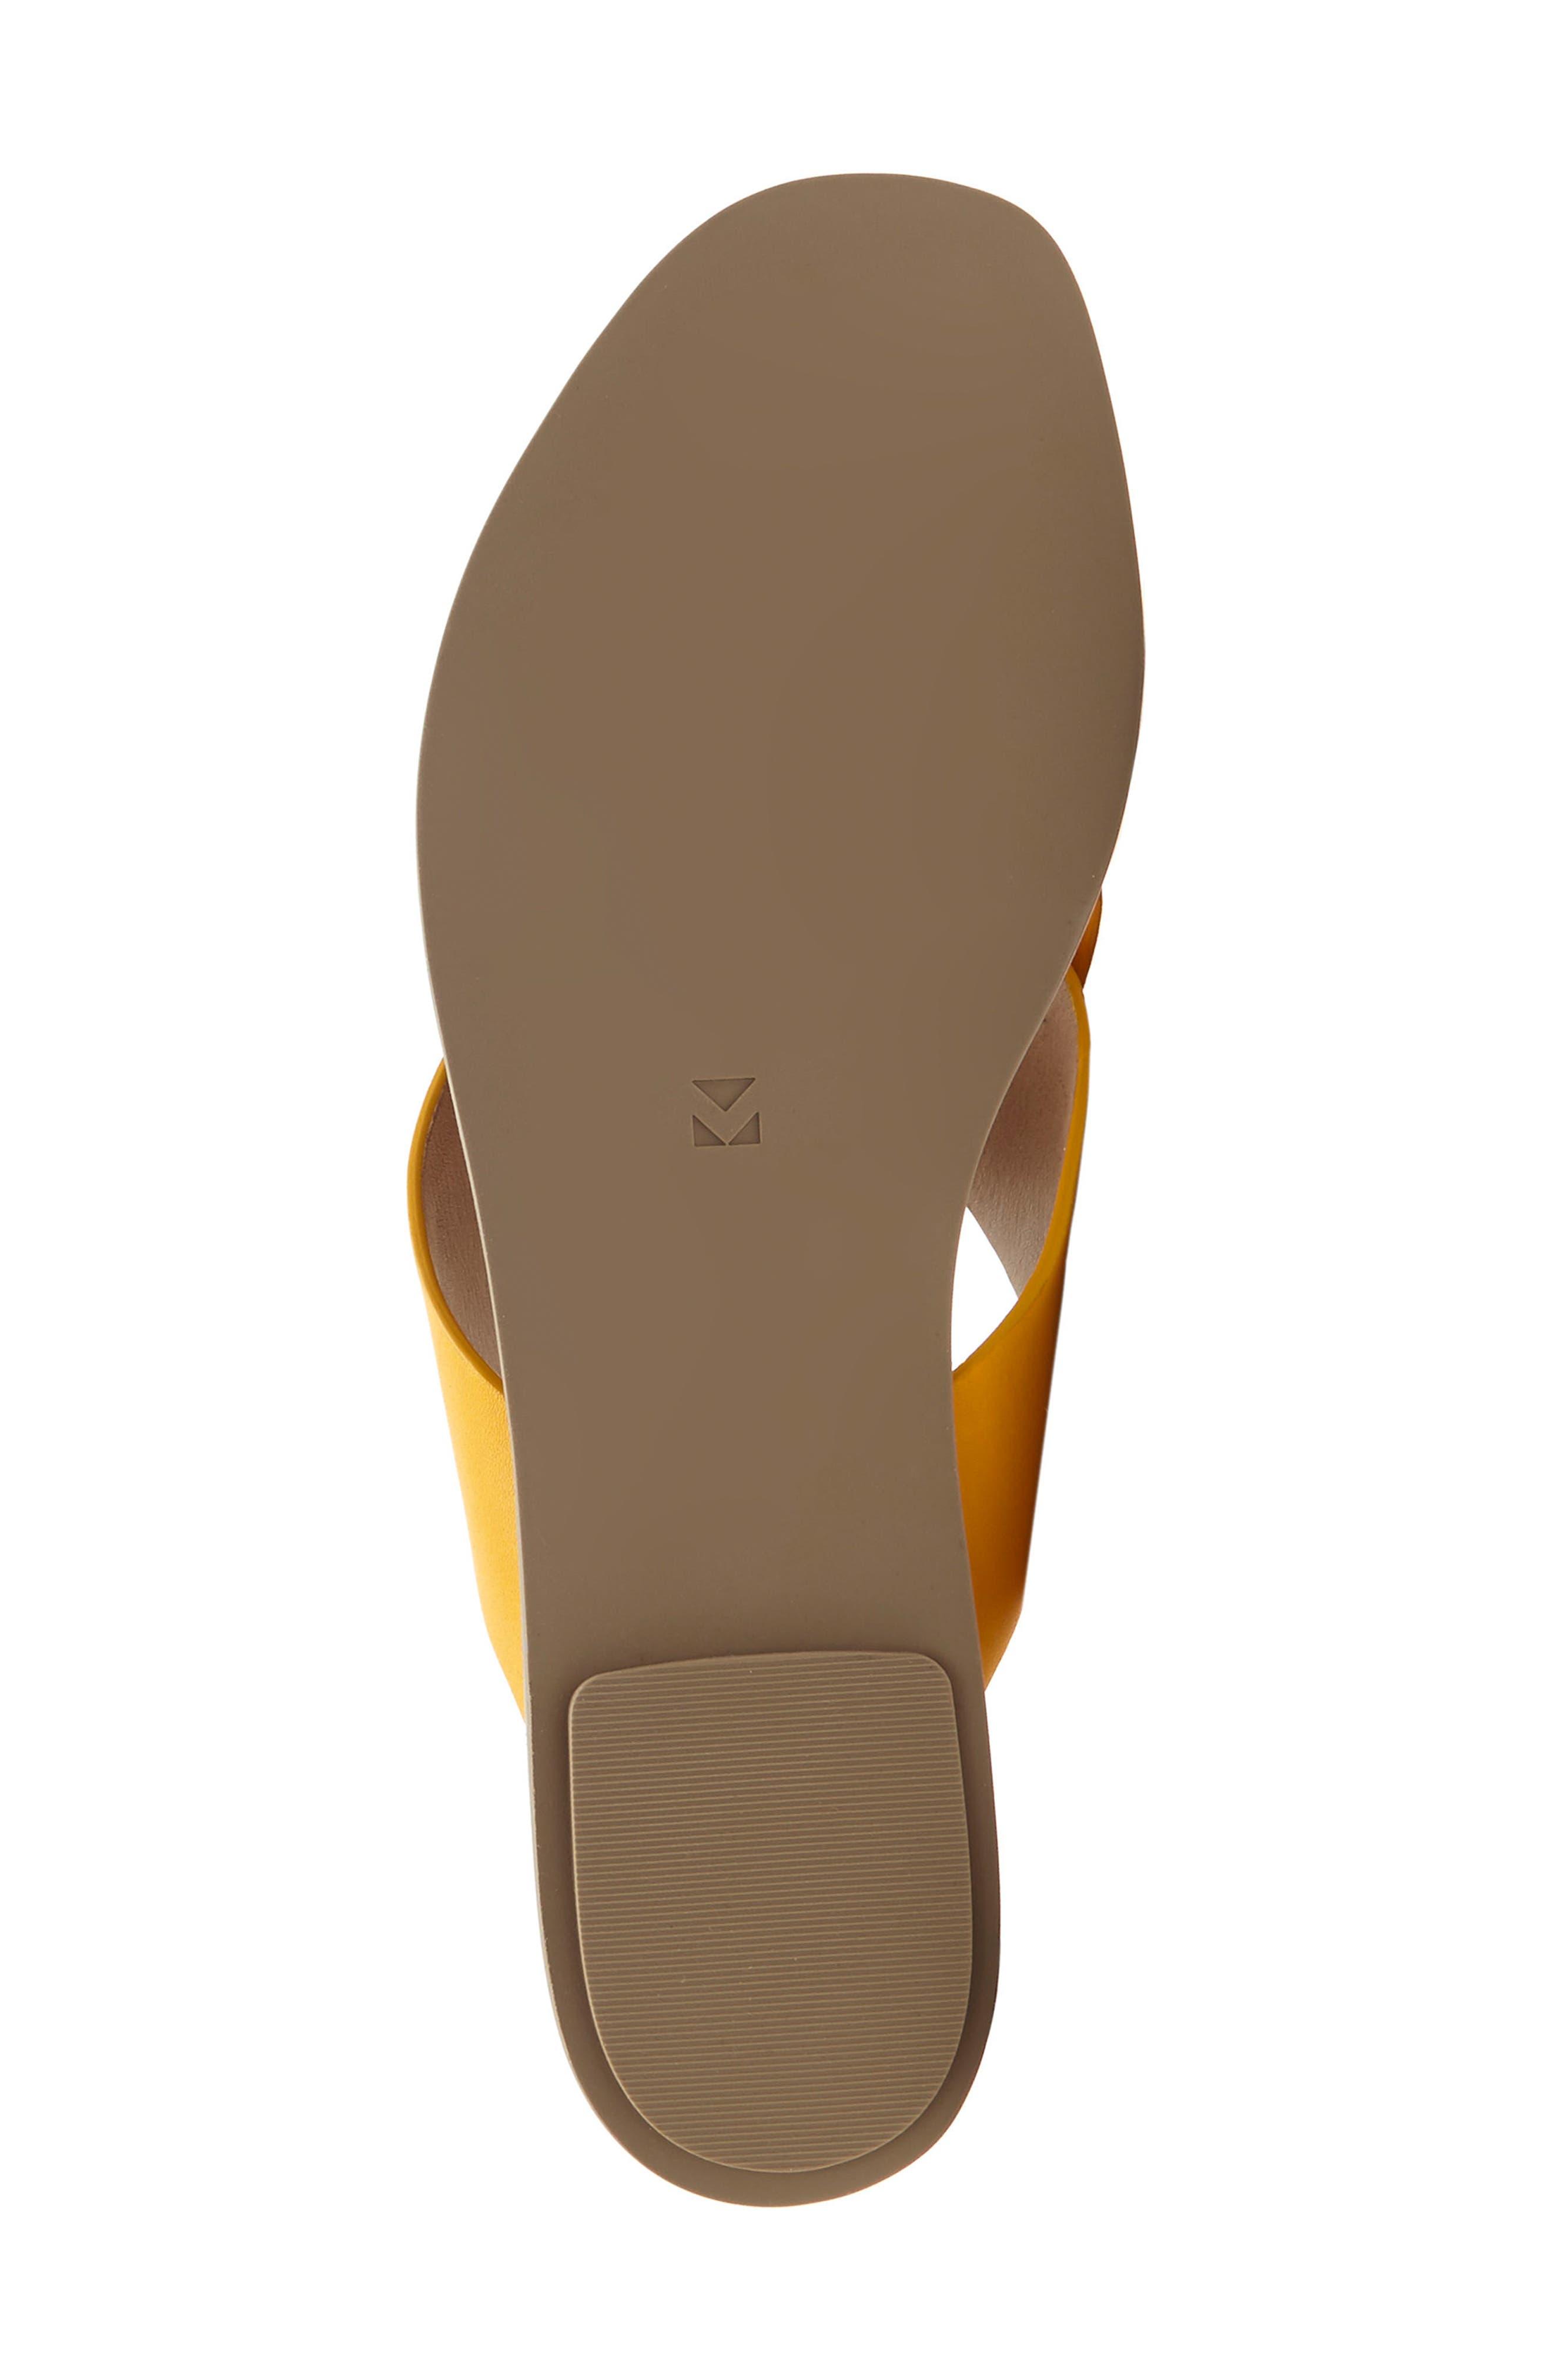 Carlein Slide Sandal,                             Alternate thumbnail 5, color,                             Mustard Leather